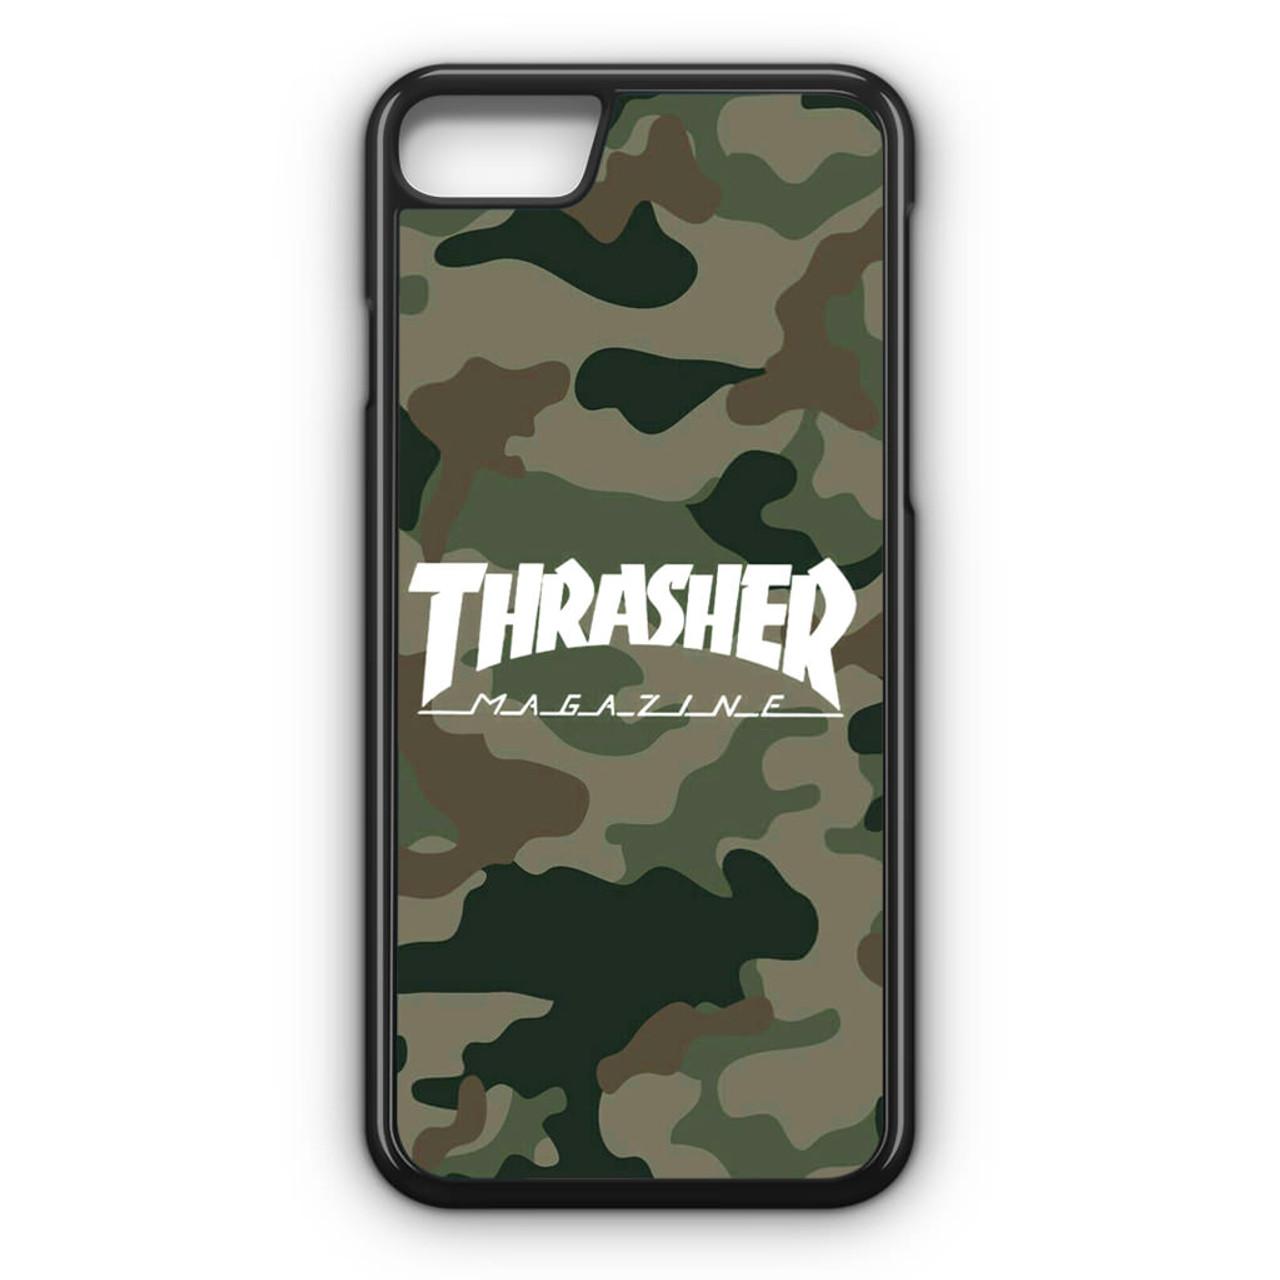 new product 6dbb8 01a72 Thrasher Magazine Bape Camo iPhone 7 Case